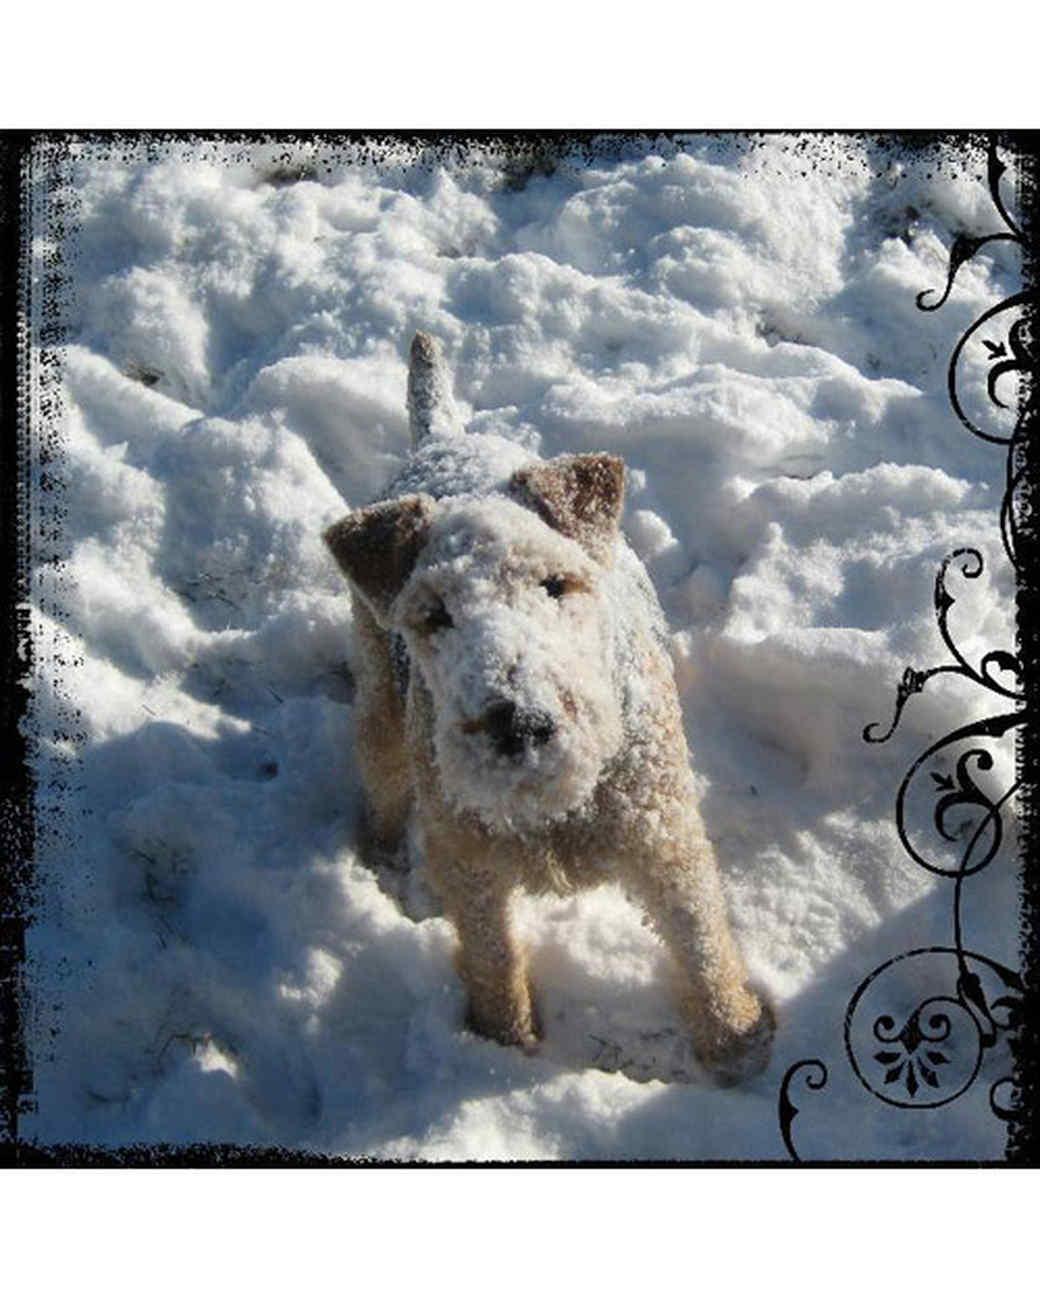 pets_snowangels_7301334_122717_19226789.jpg